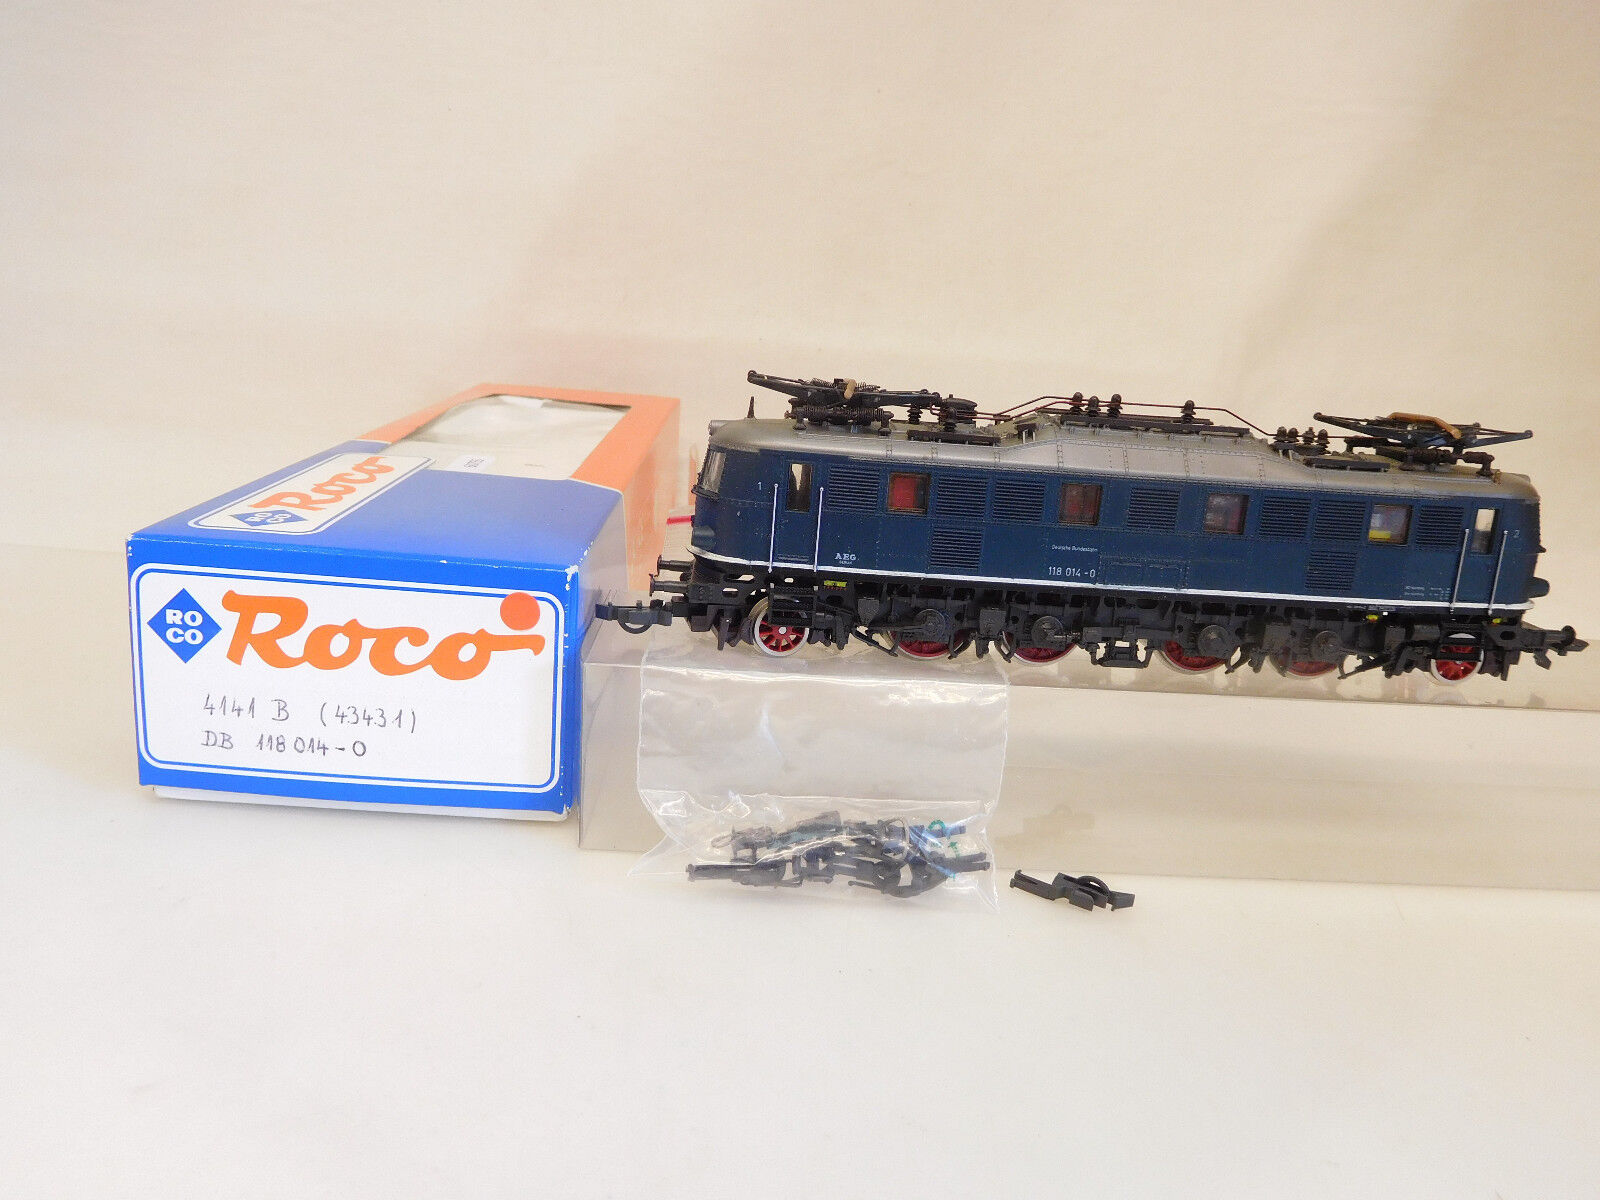 MES-60755 Roco 4141 B H0 E-lok DB 118 014-0 sehr guter Zustand,